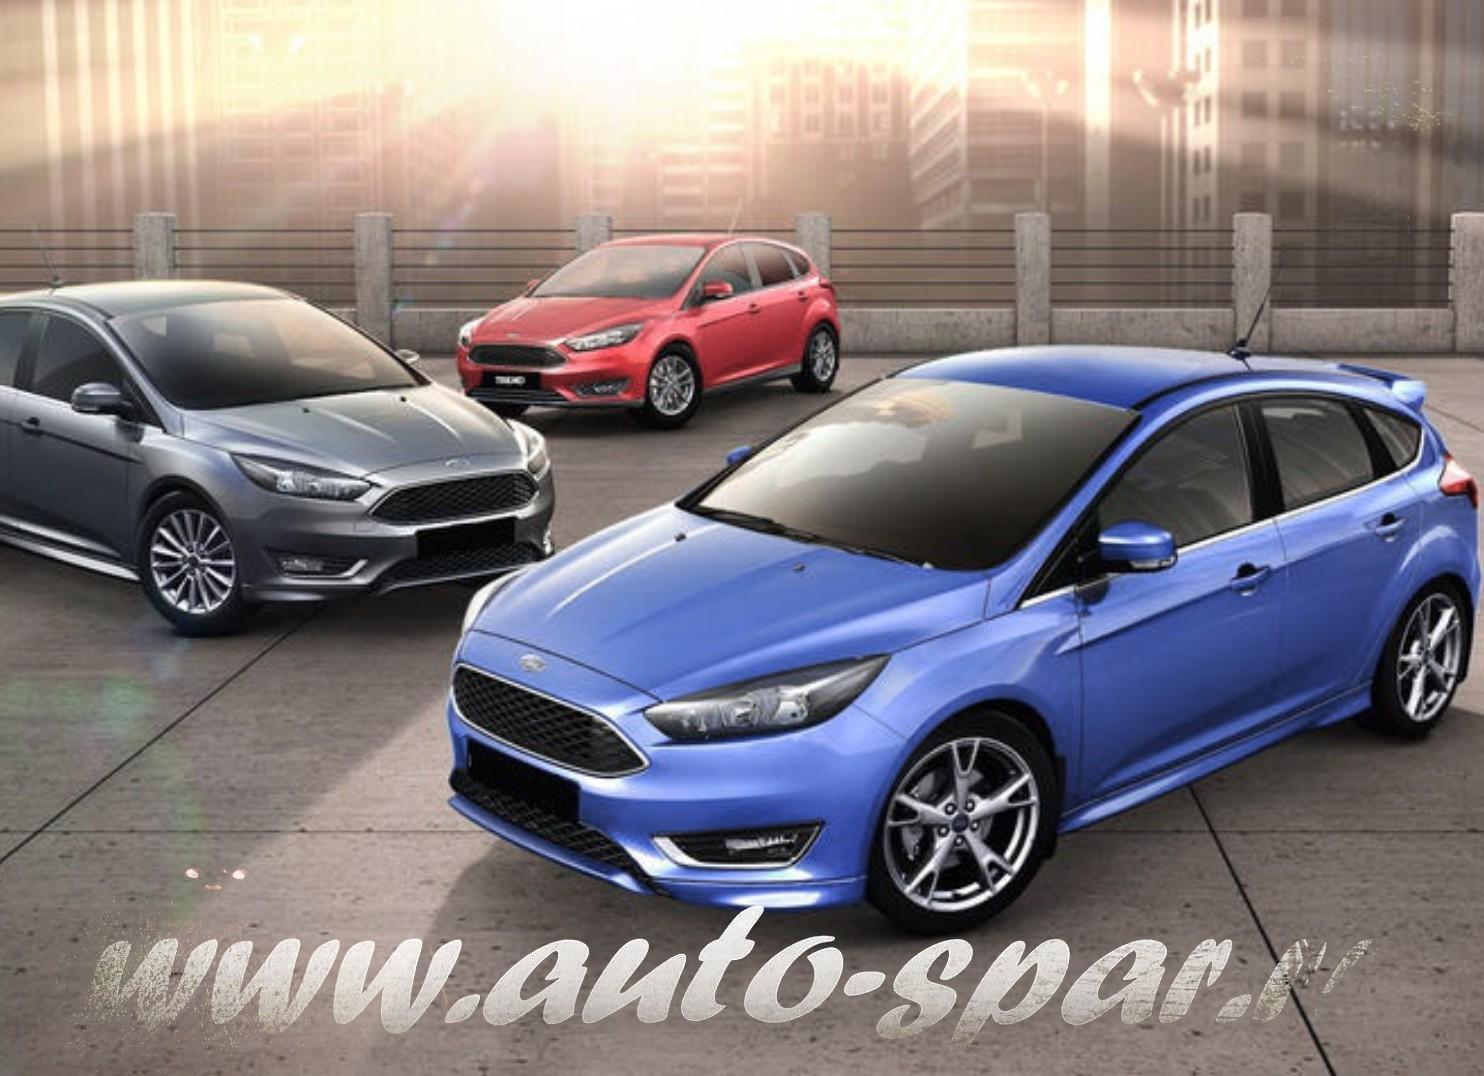 ������� ����� ����� Ford Focus � ����� �� �������� � ������� � ������.